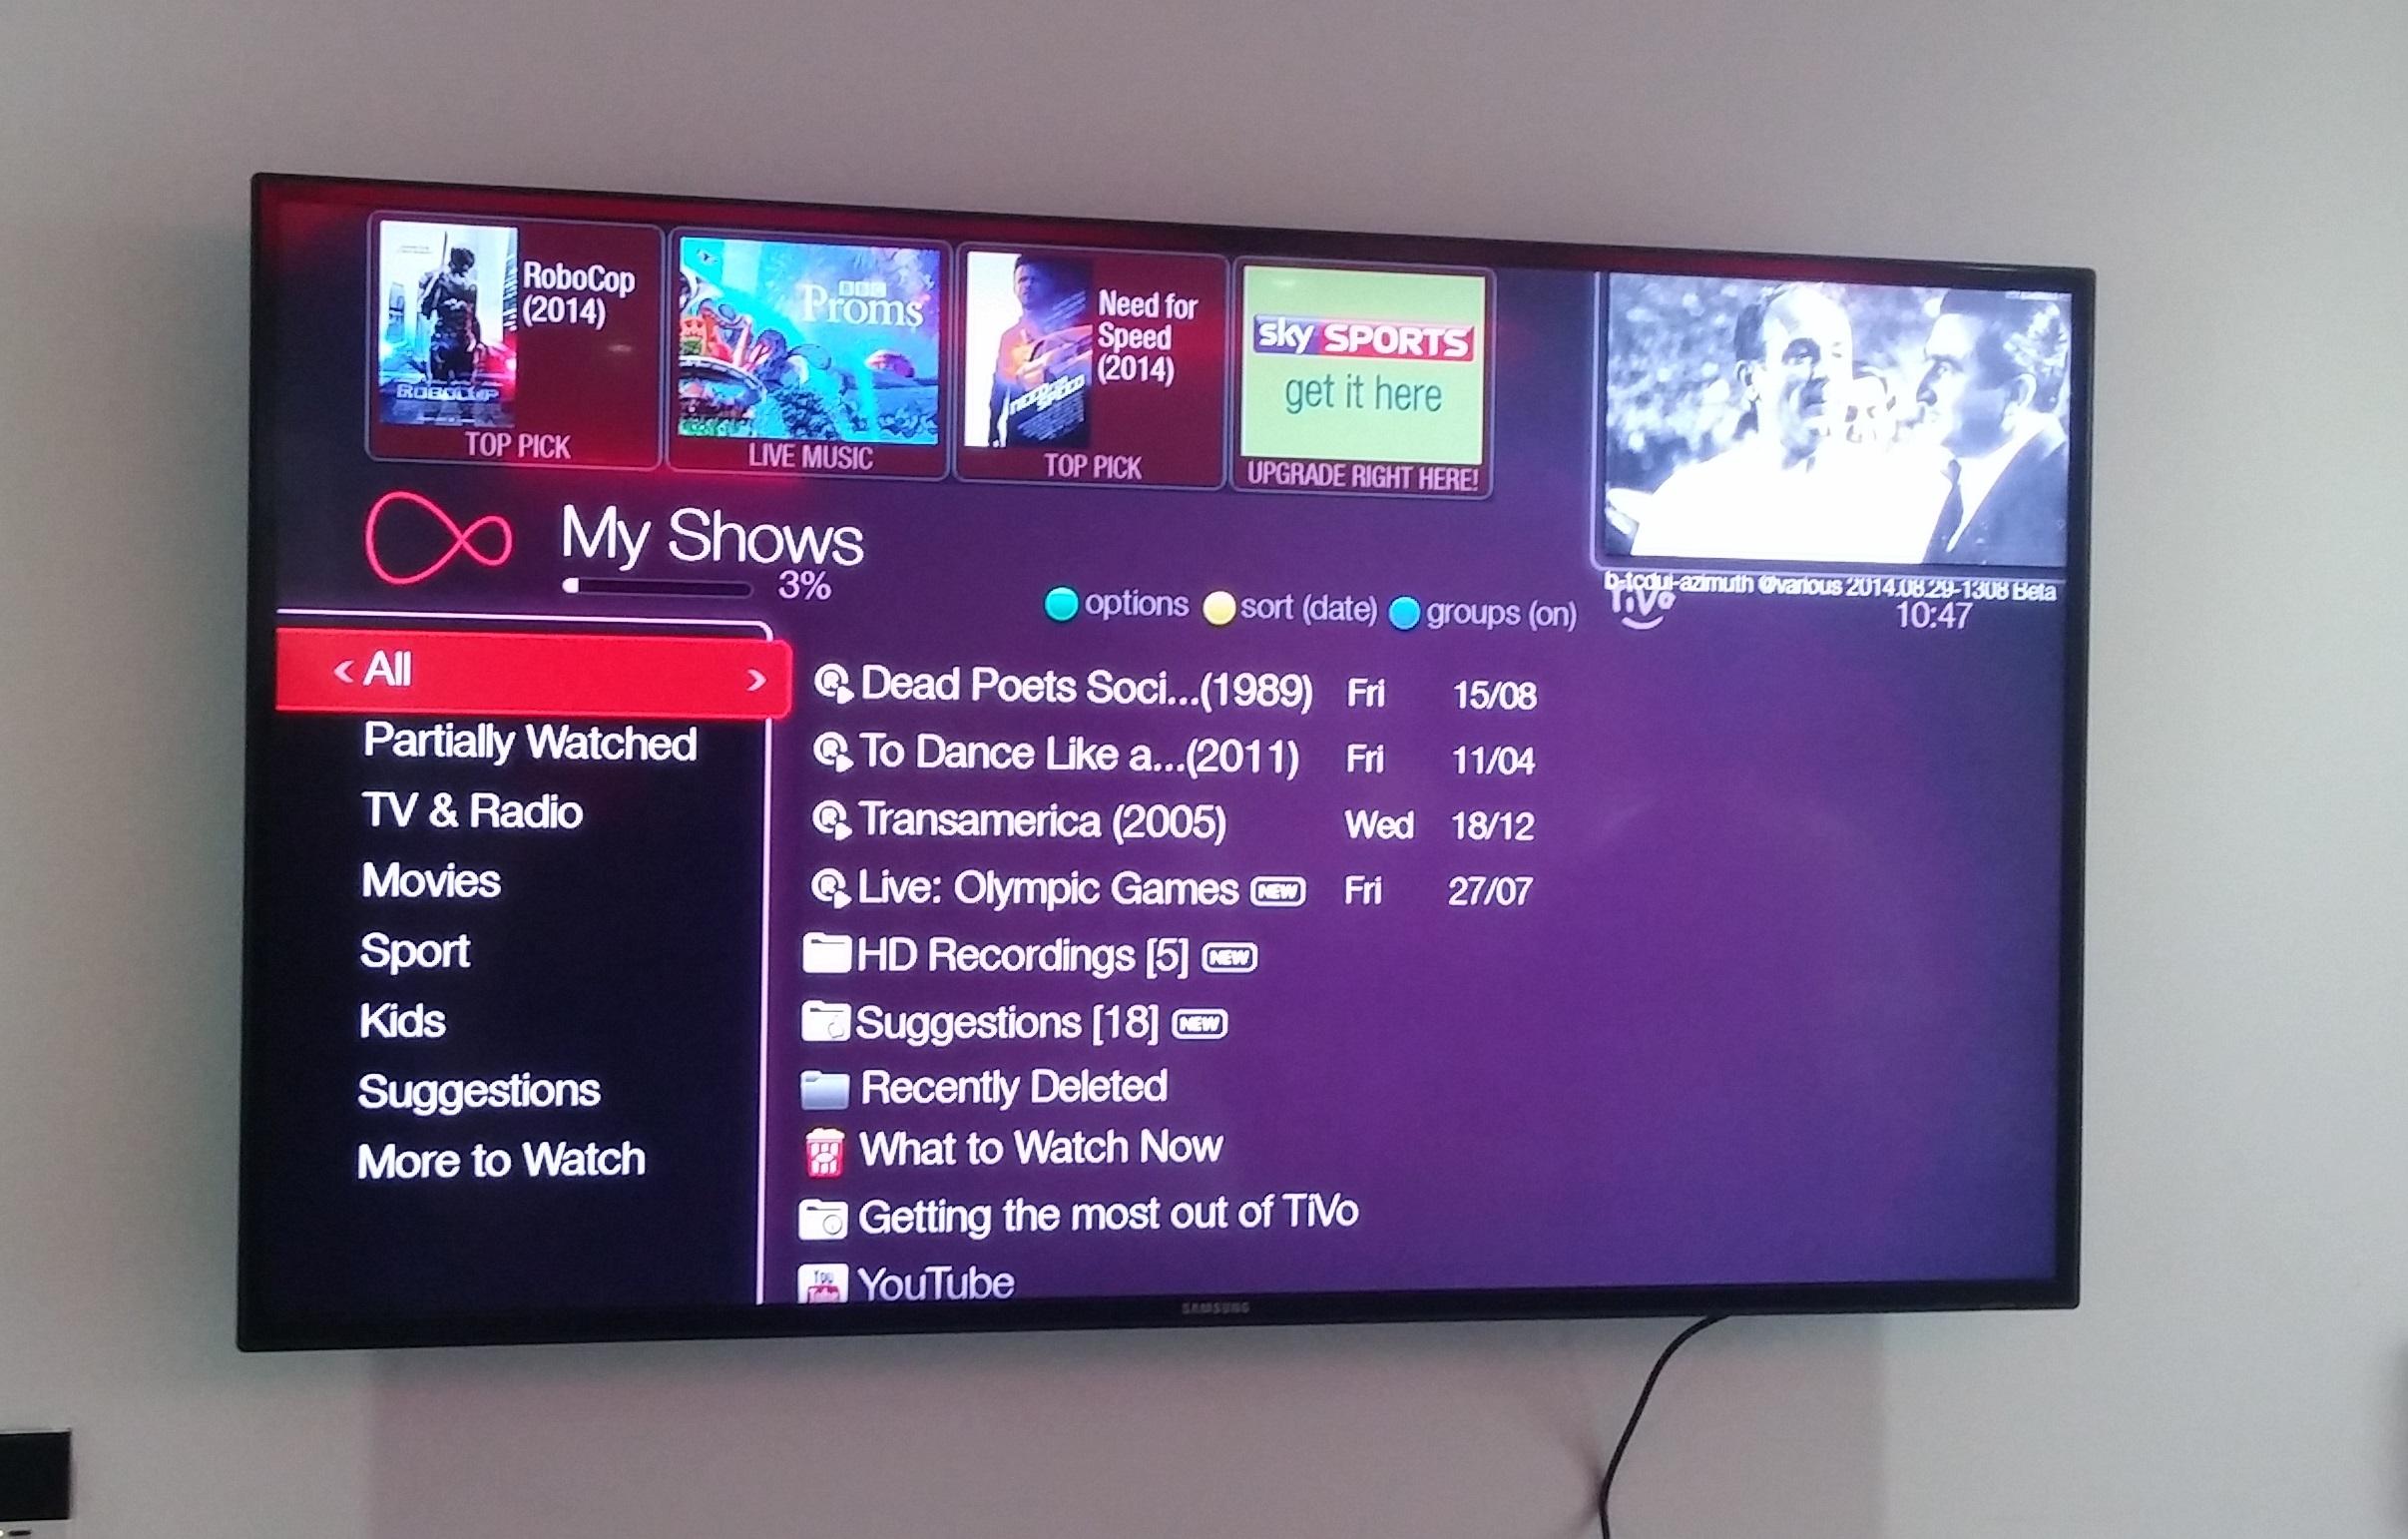 Virgin Media Completely Overhauls TiVo UI and Navigation